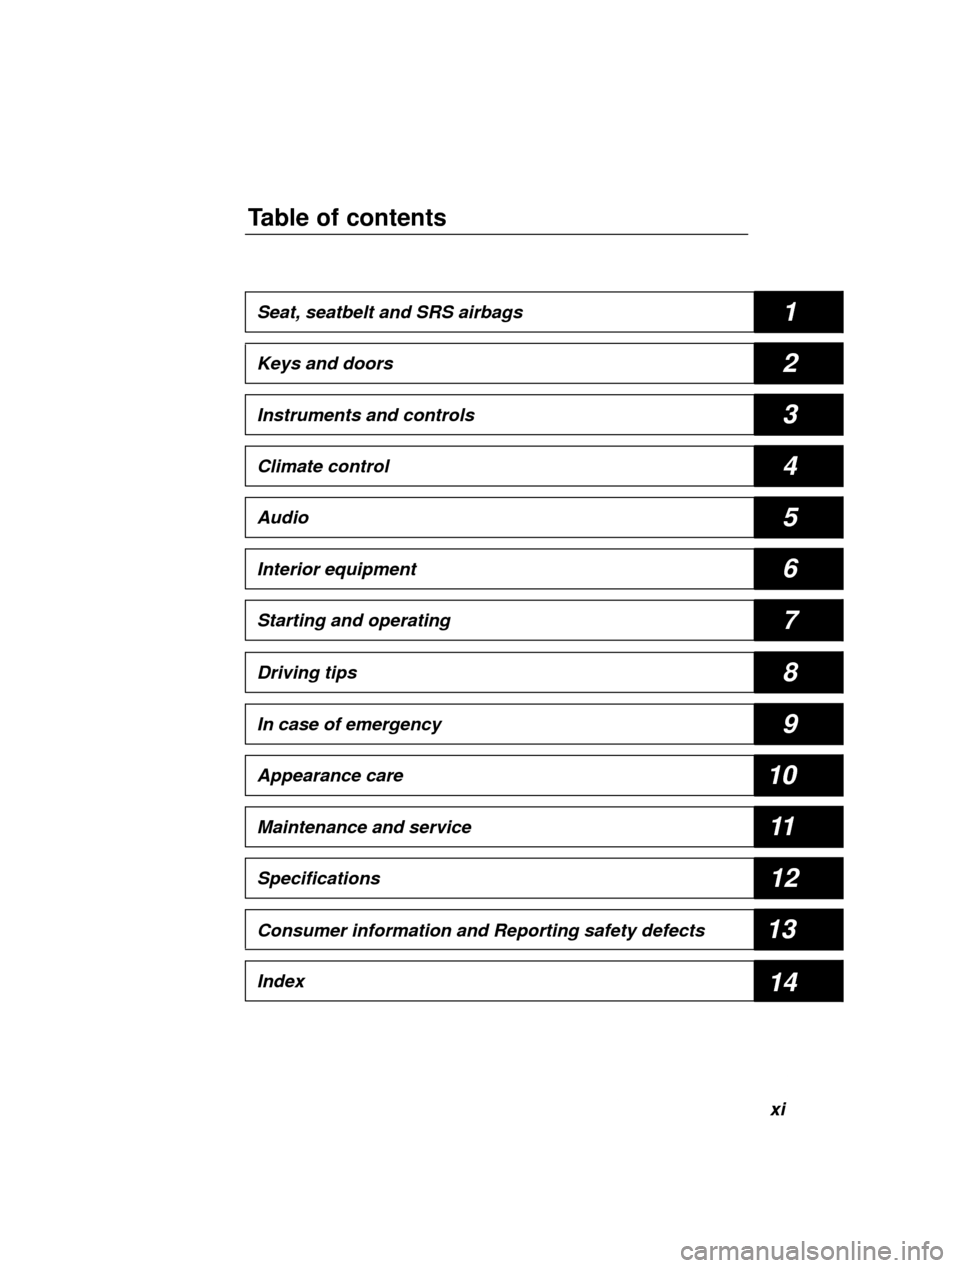 SUBARU LEGACY 2000 3.G Owners Manual